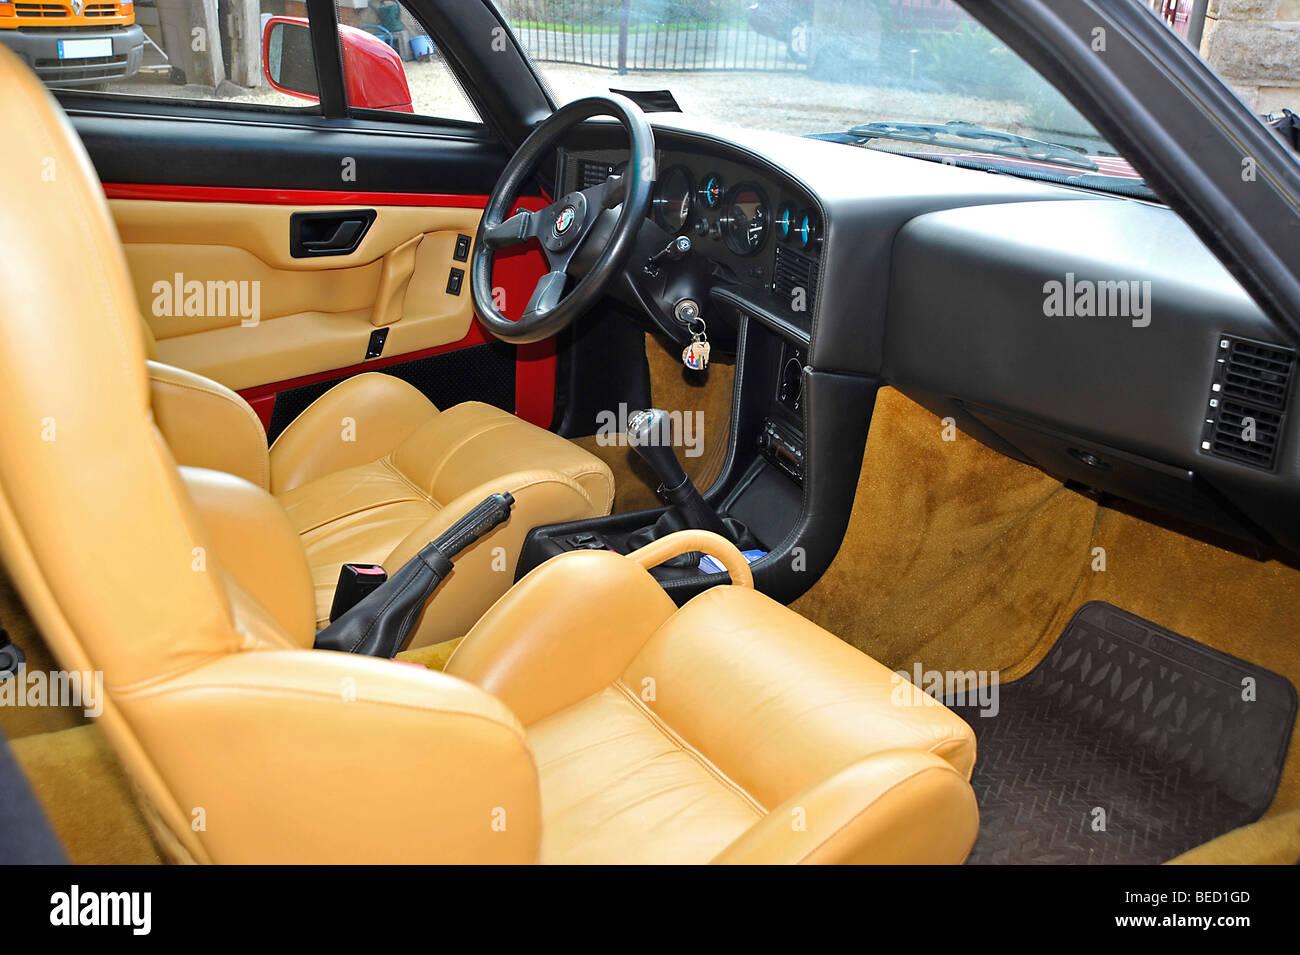 Alfa Romeo Zagato SZ classic Italian sports car interior Stock Photo ...